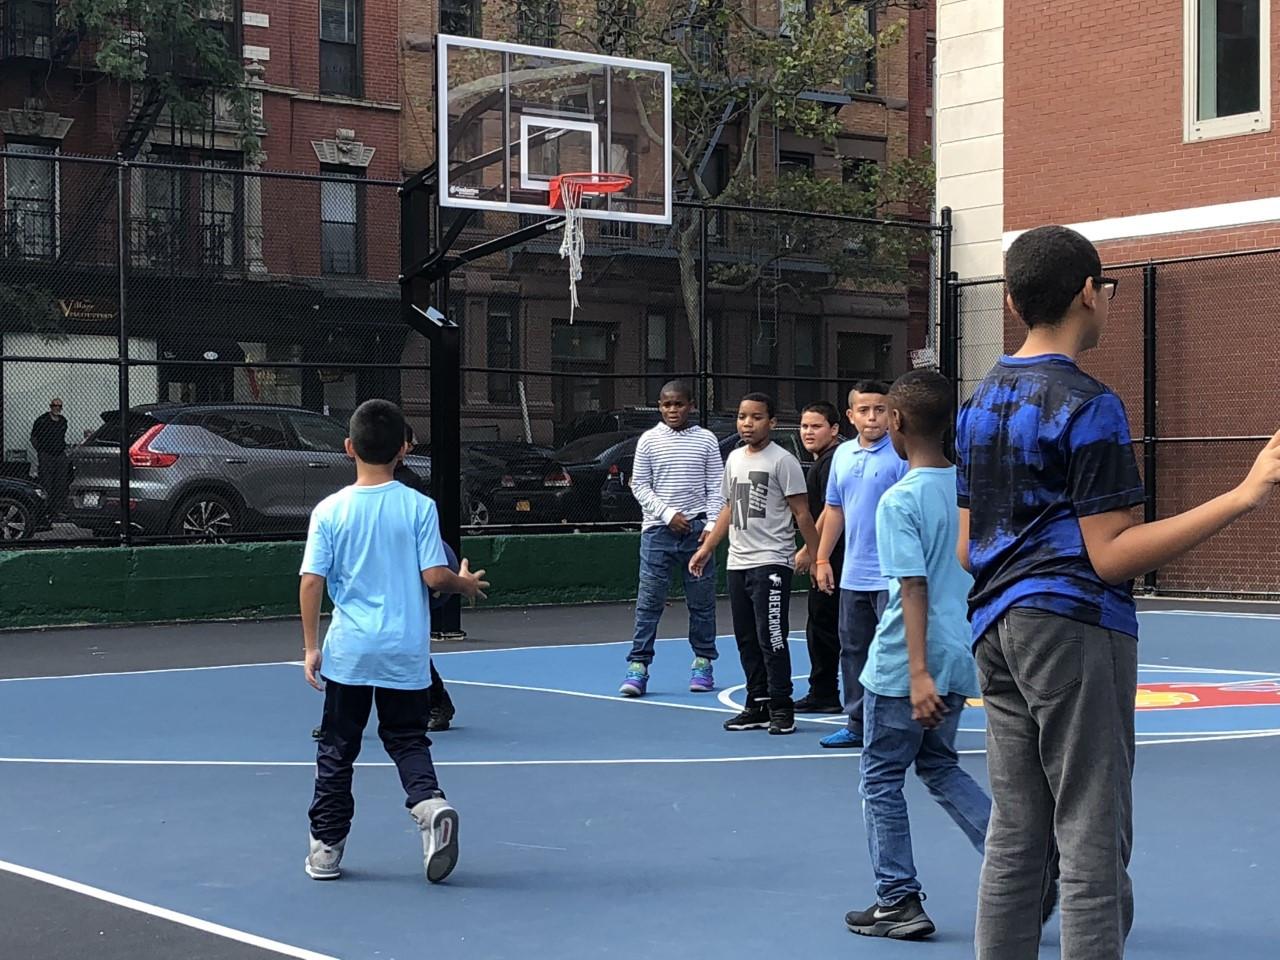 School Yard - Basketball Court